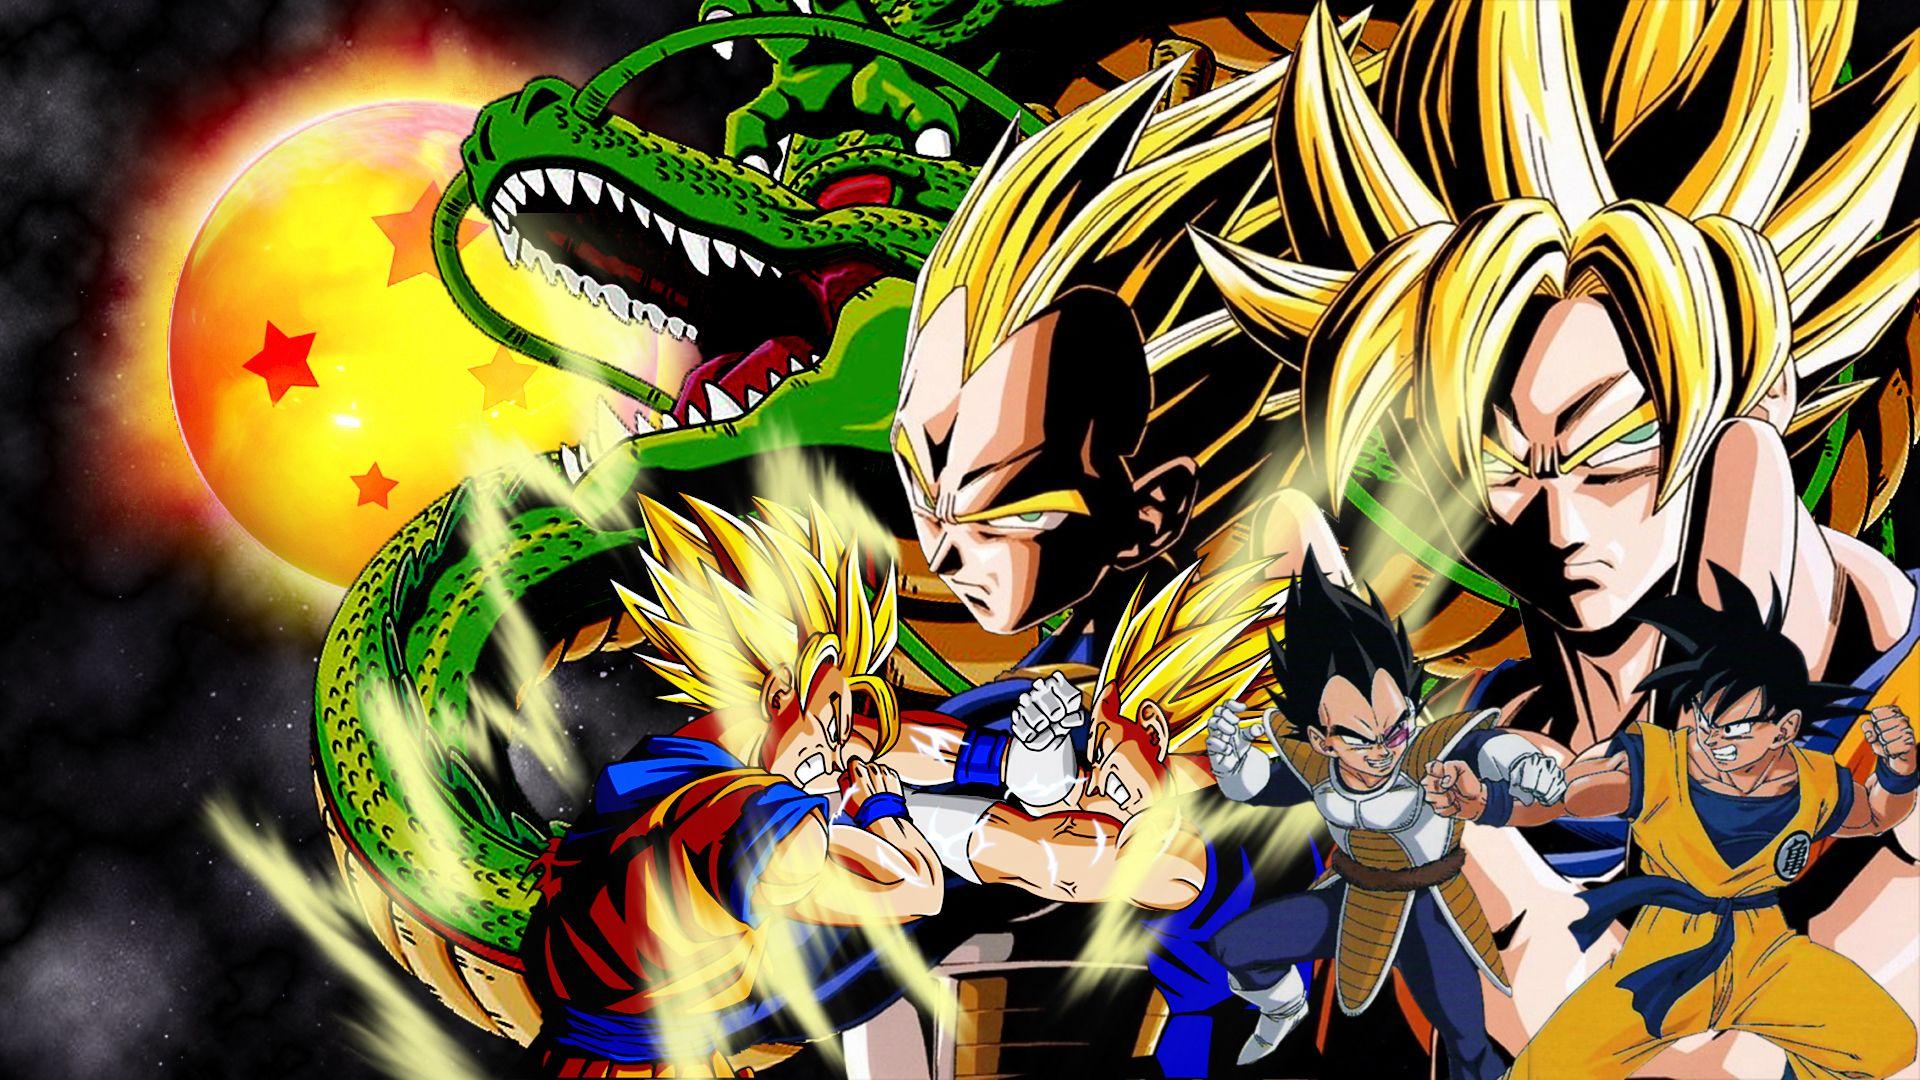 Dbz Goku Vs Vegeta Goku Wallpaper Dragon Ball Art Dragon Ball Super Wallpapers